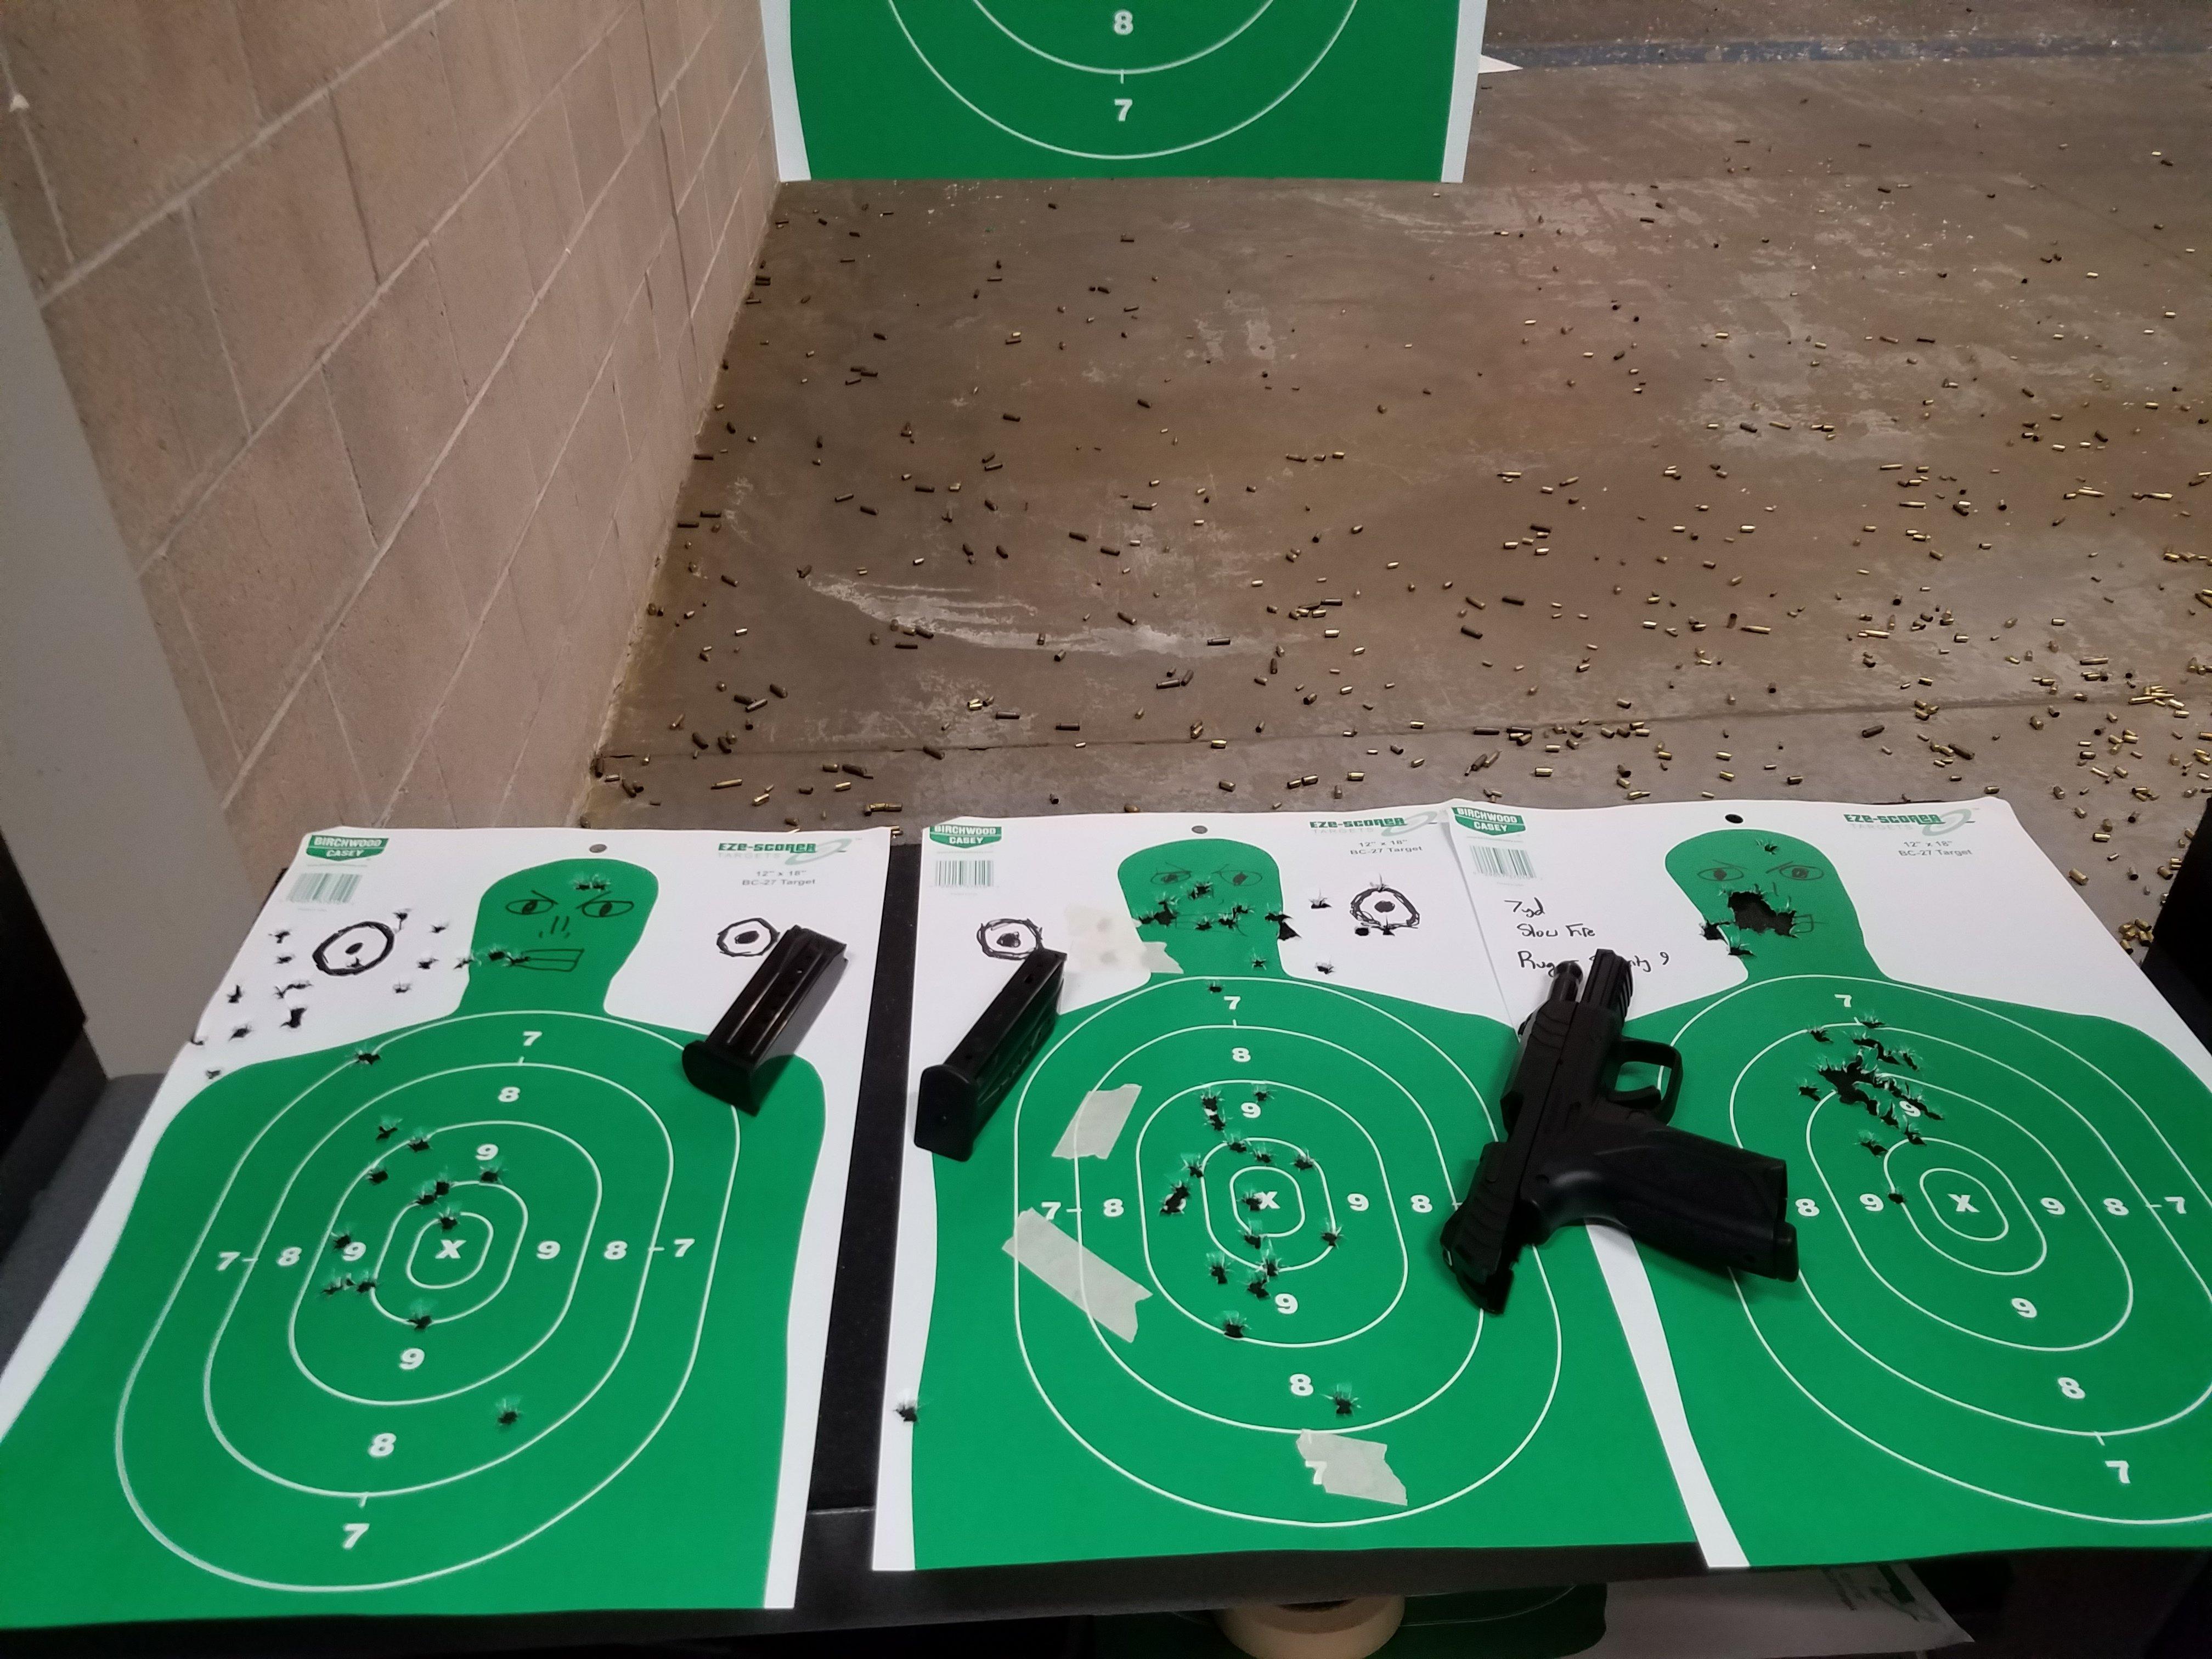 Ruger Security 9 targets